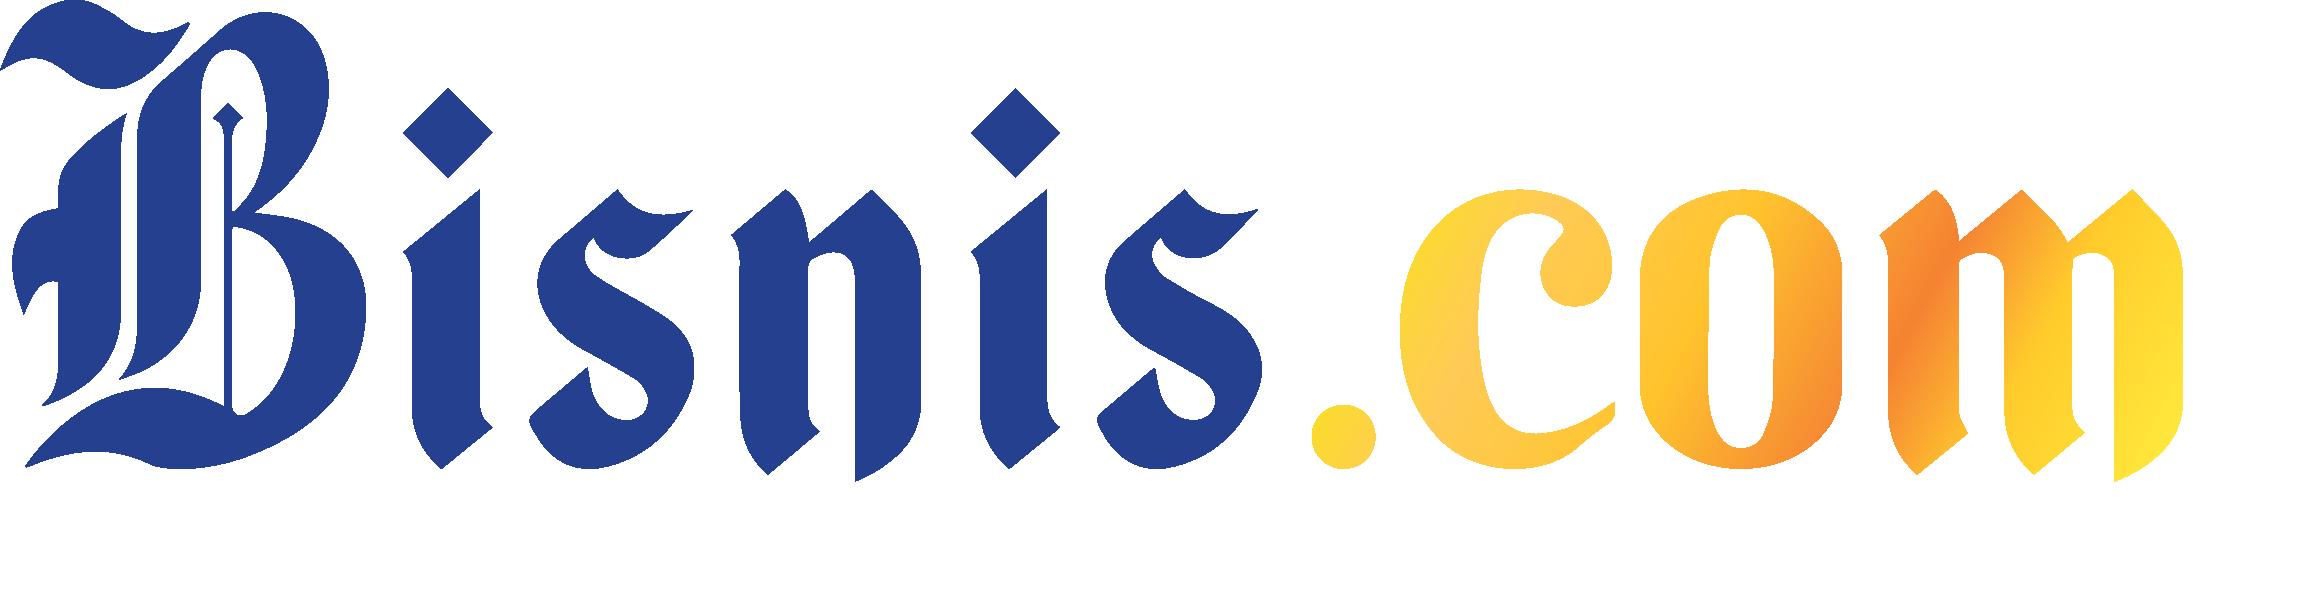 logo bisniscom 2019